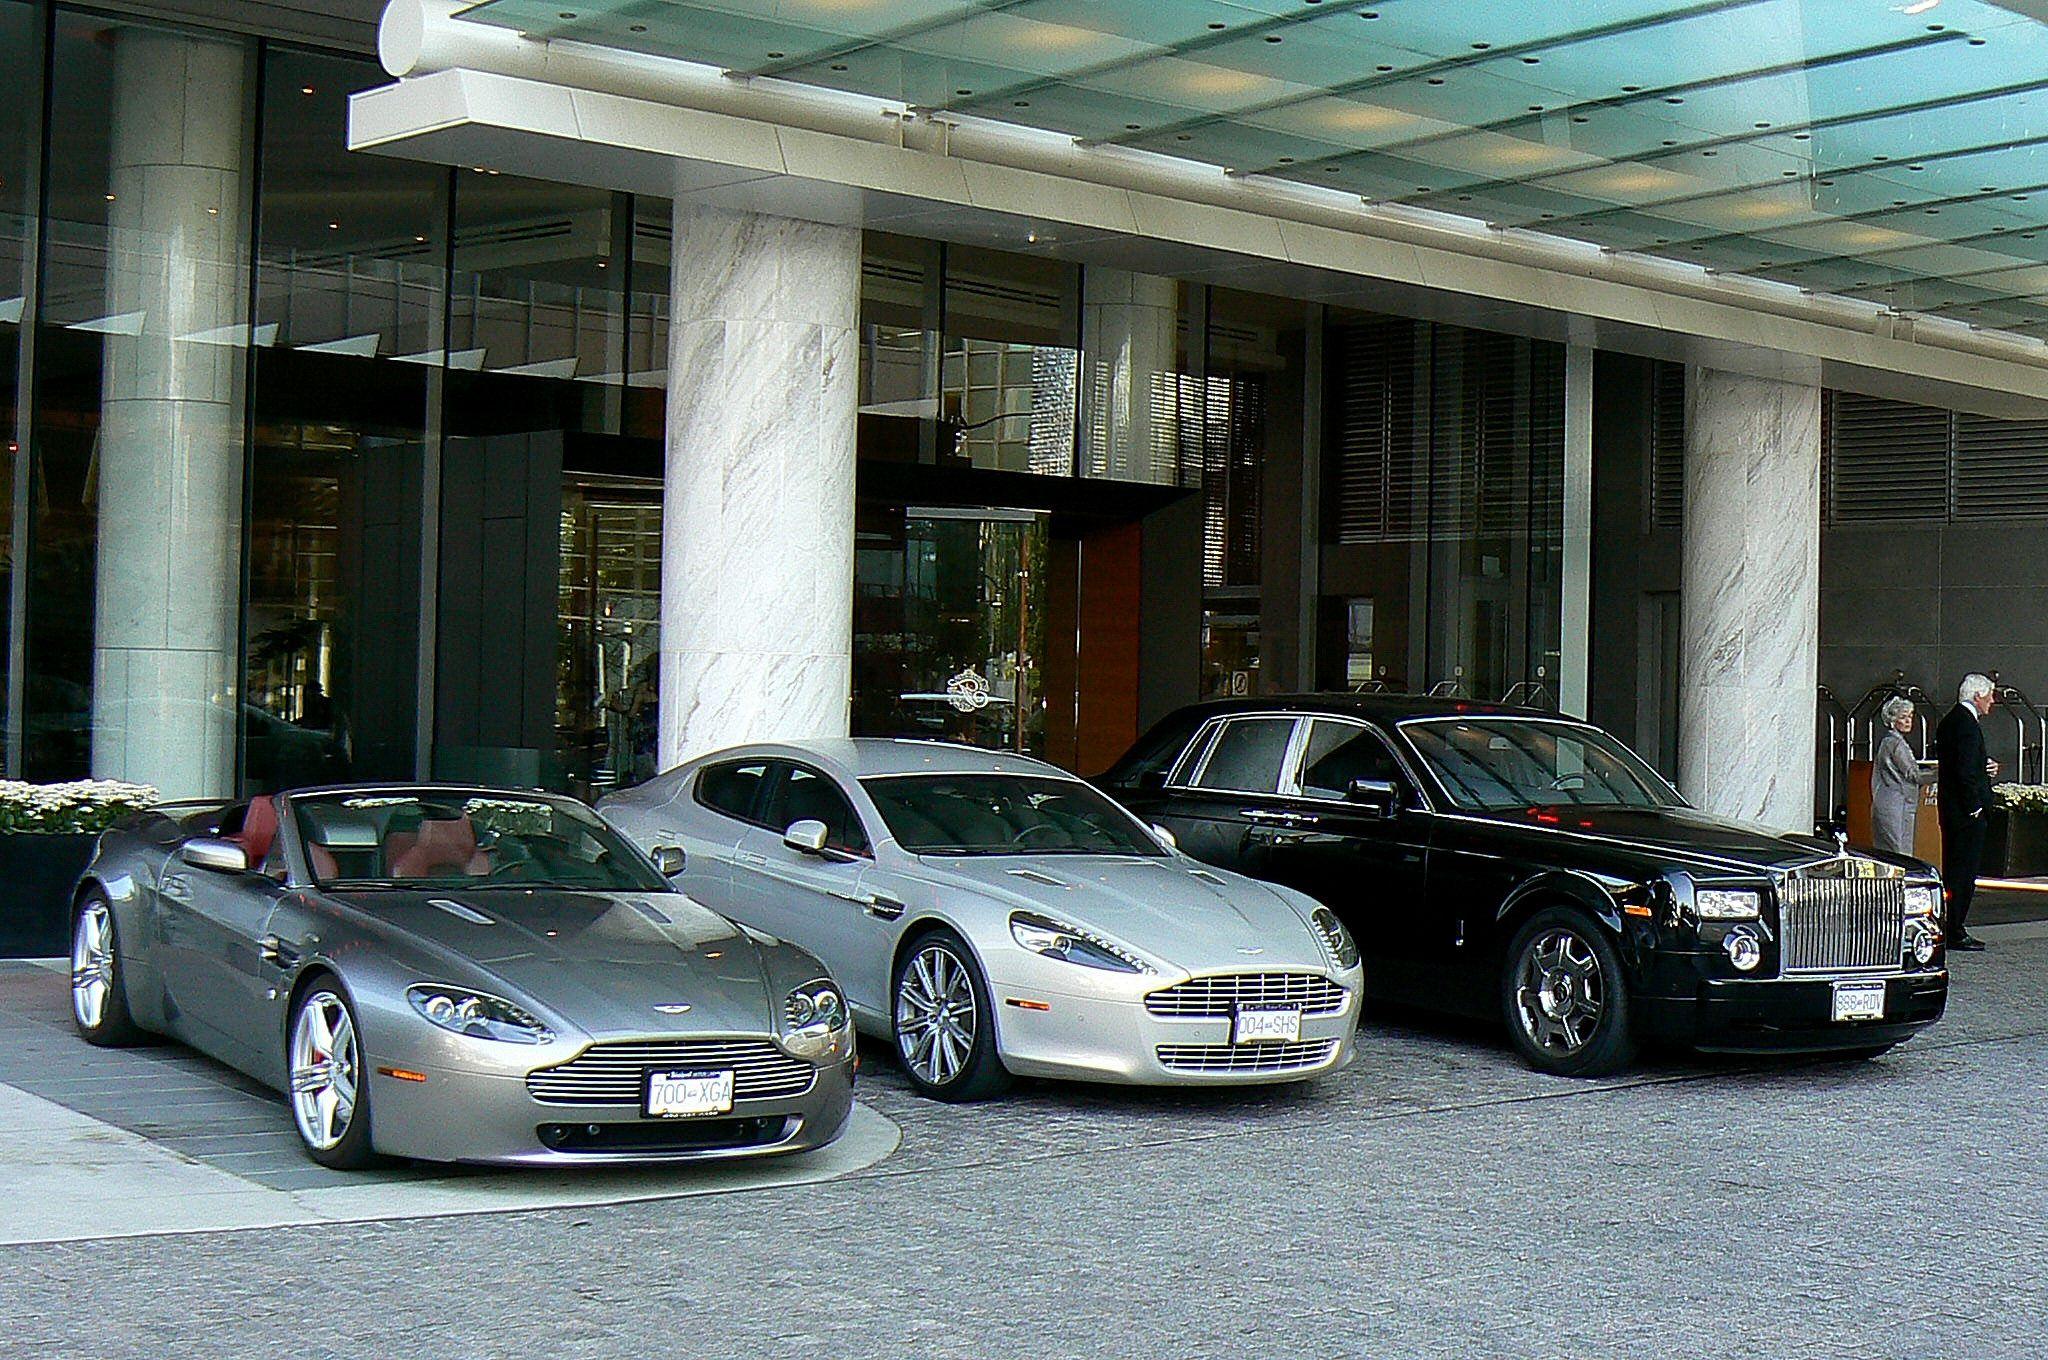 Aston Martin Vantage Aston Martin Rapide Rolls Royce Phantom